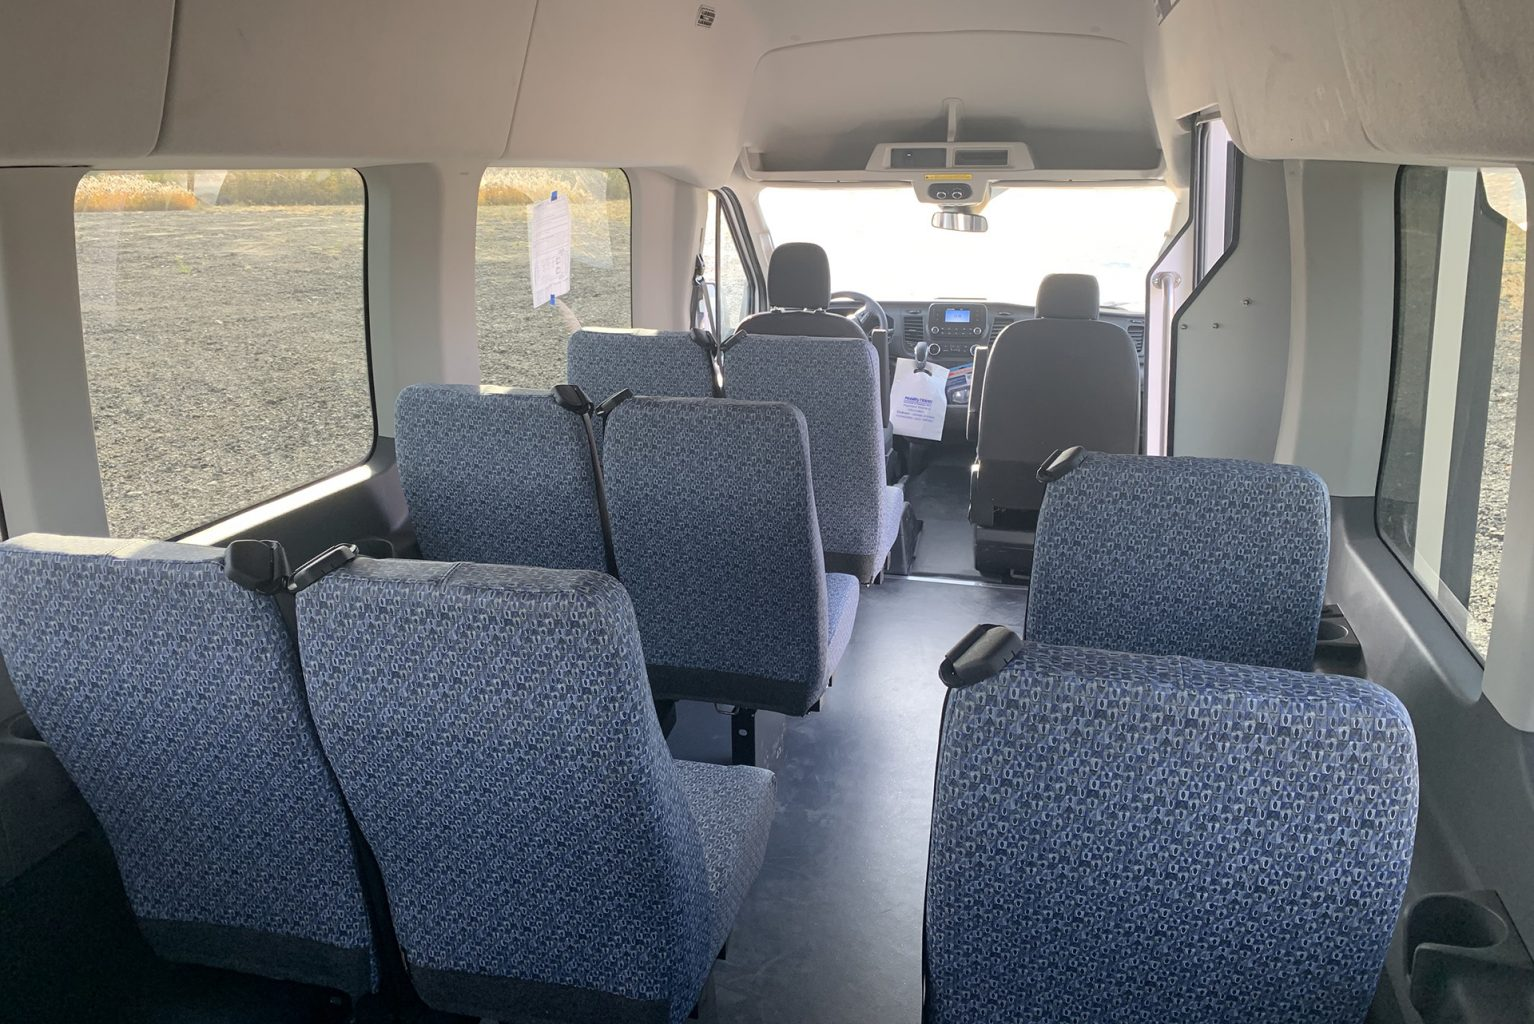 Public Transportation interior seating